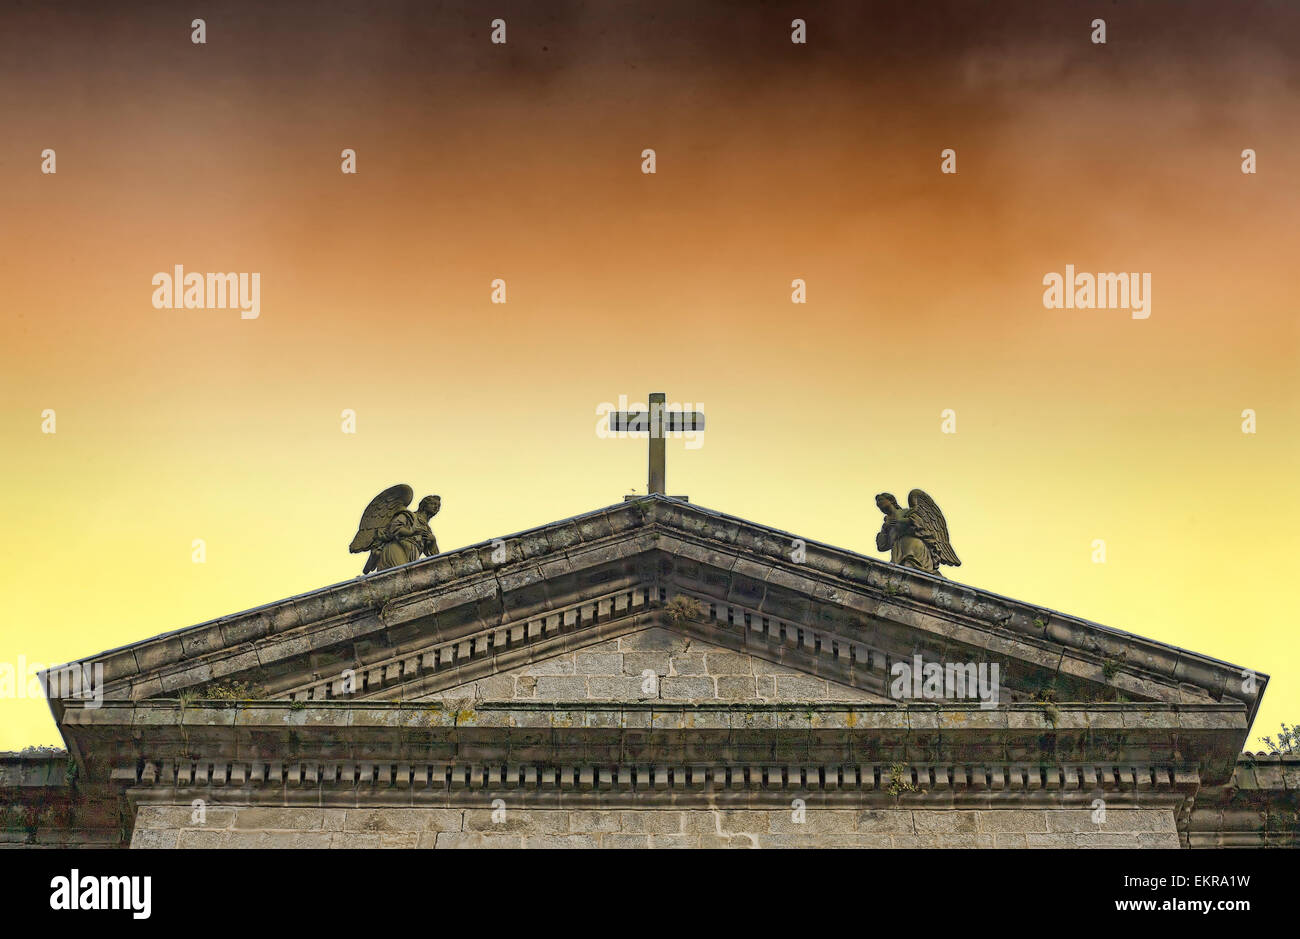 Pediment of a church with a threatening sky, Santiago de Compostela, Spain - Stock Image